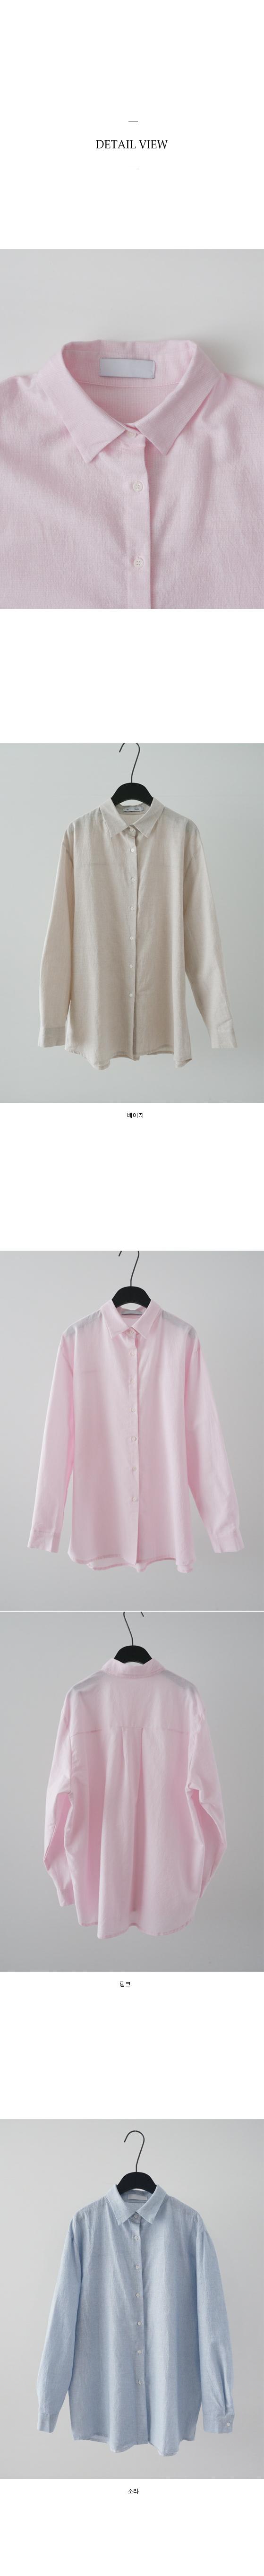 tiny pinstripe shirt